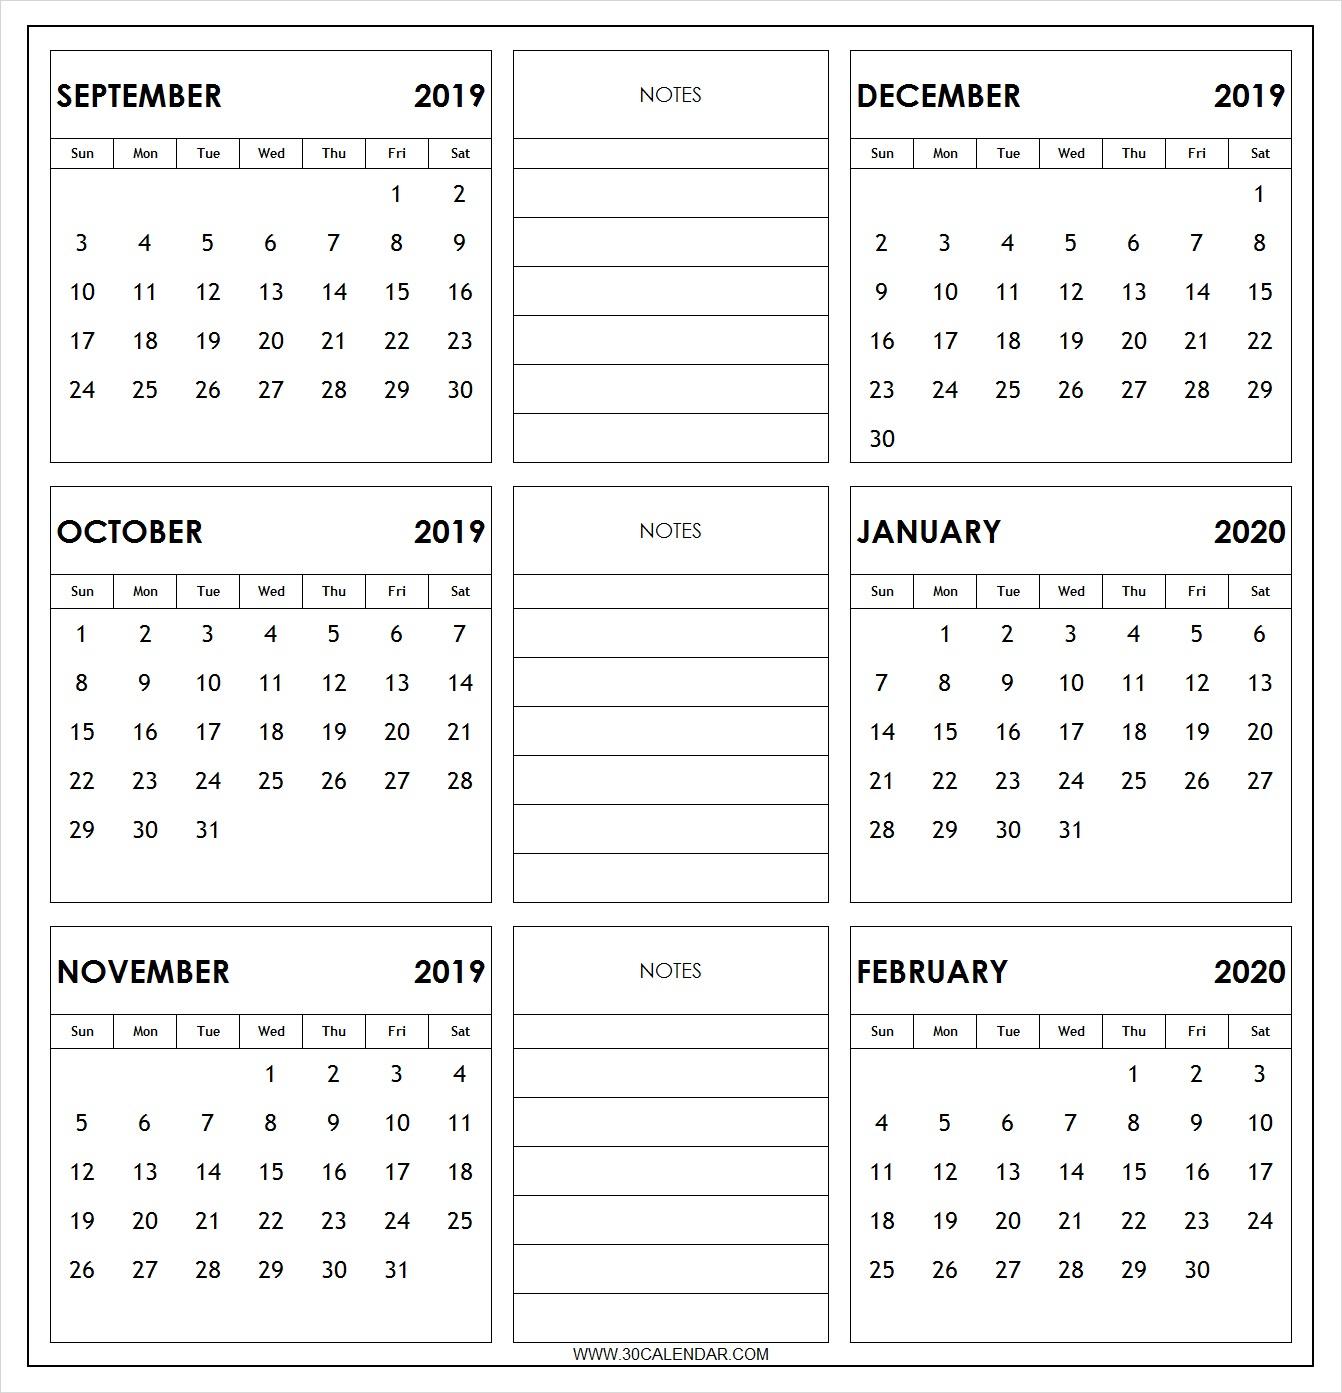 September 2019 To February 2020 Calendar Printable | 6 Month regarding Printable Six Month Calendar